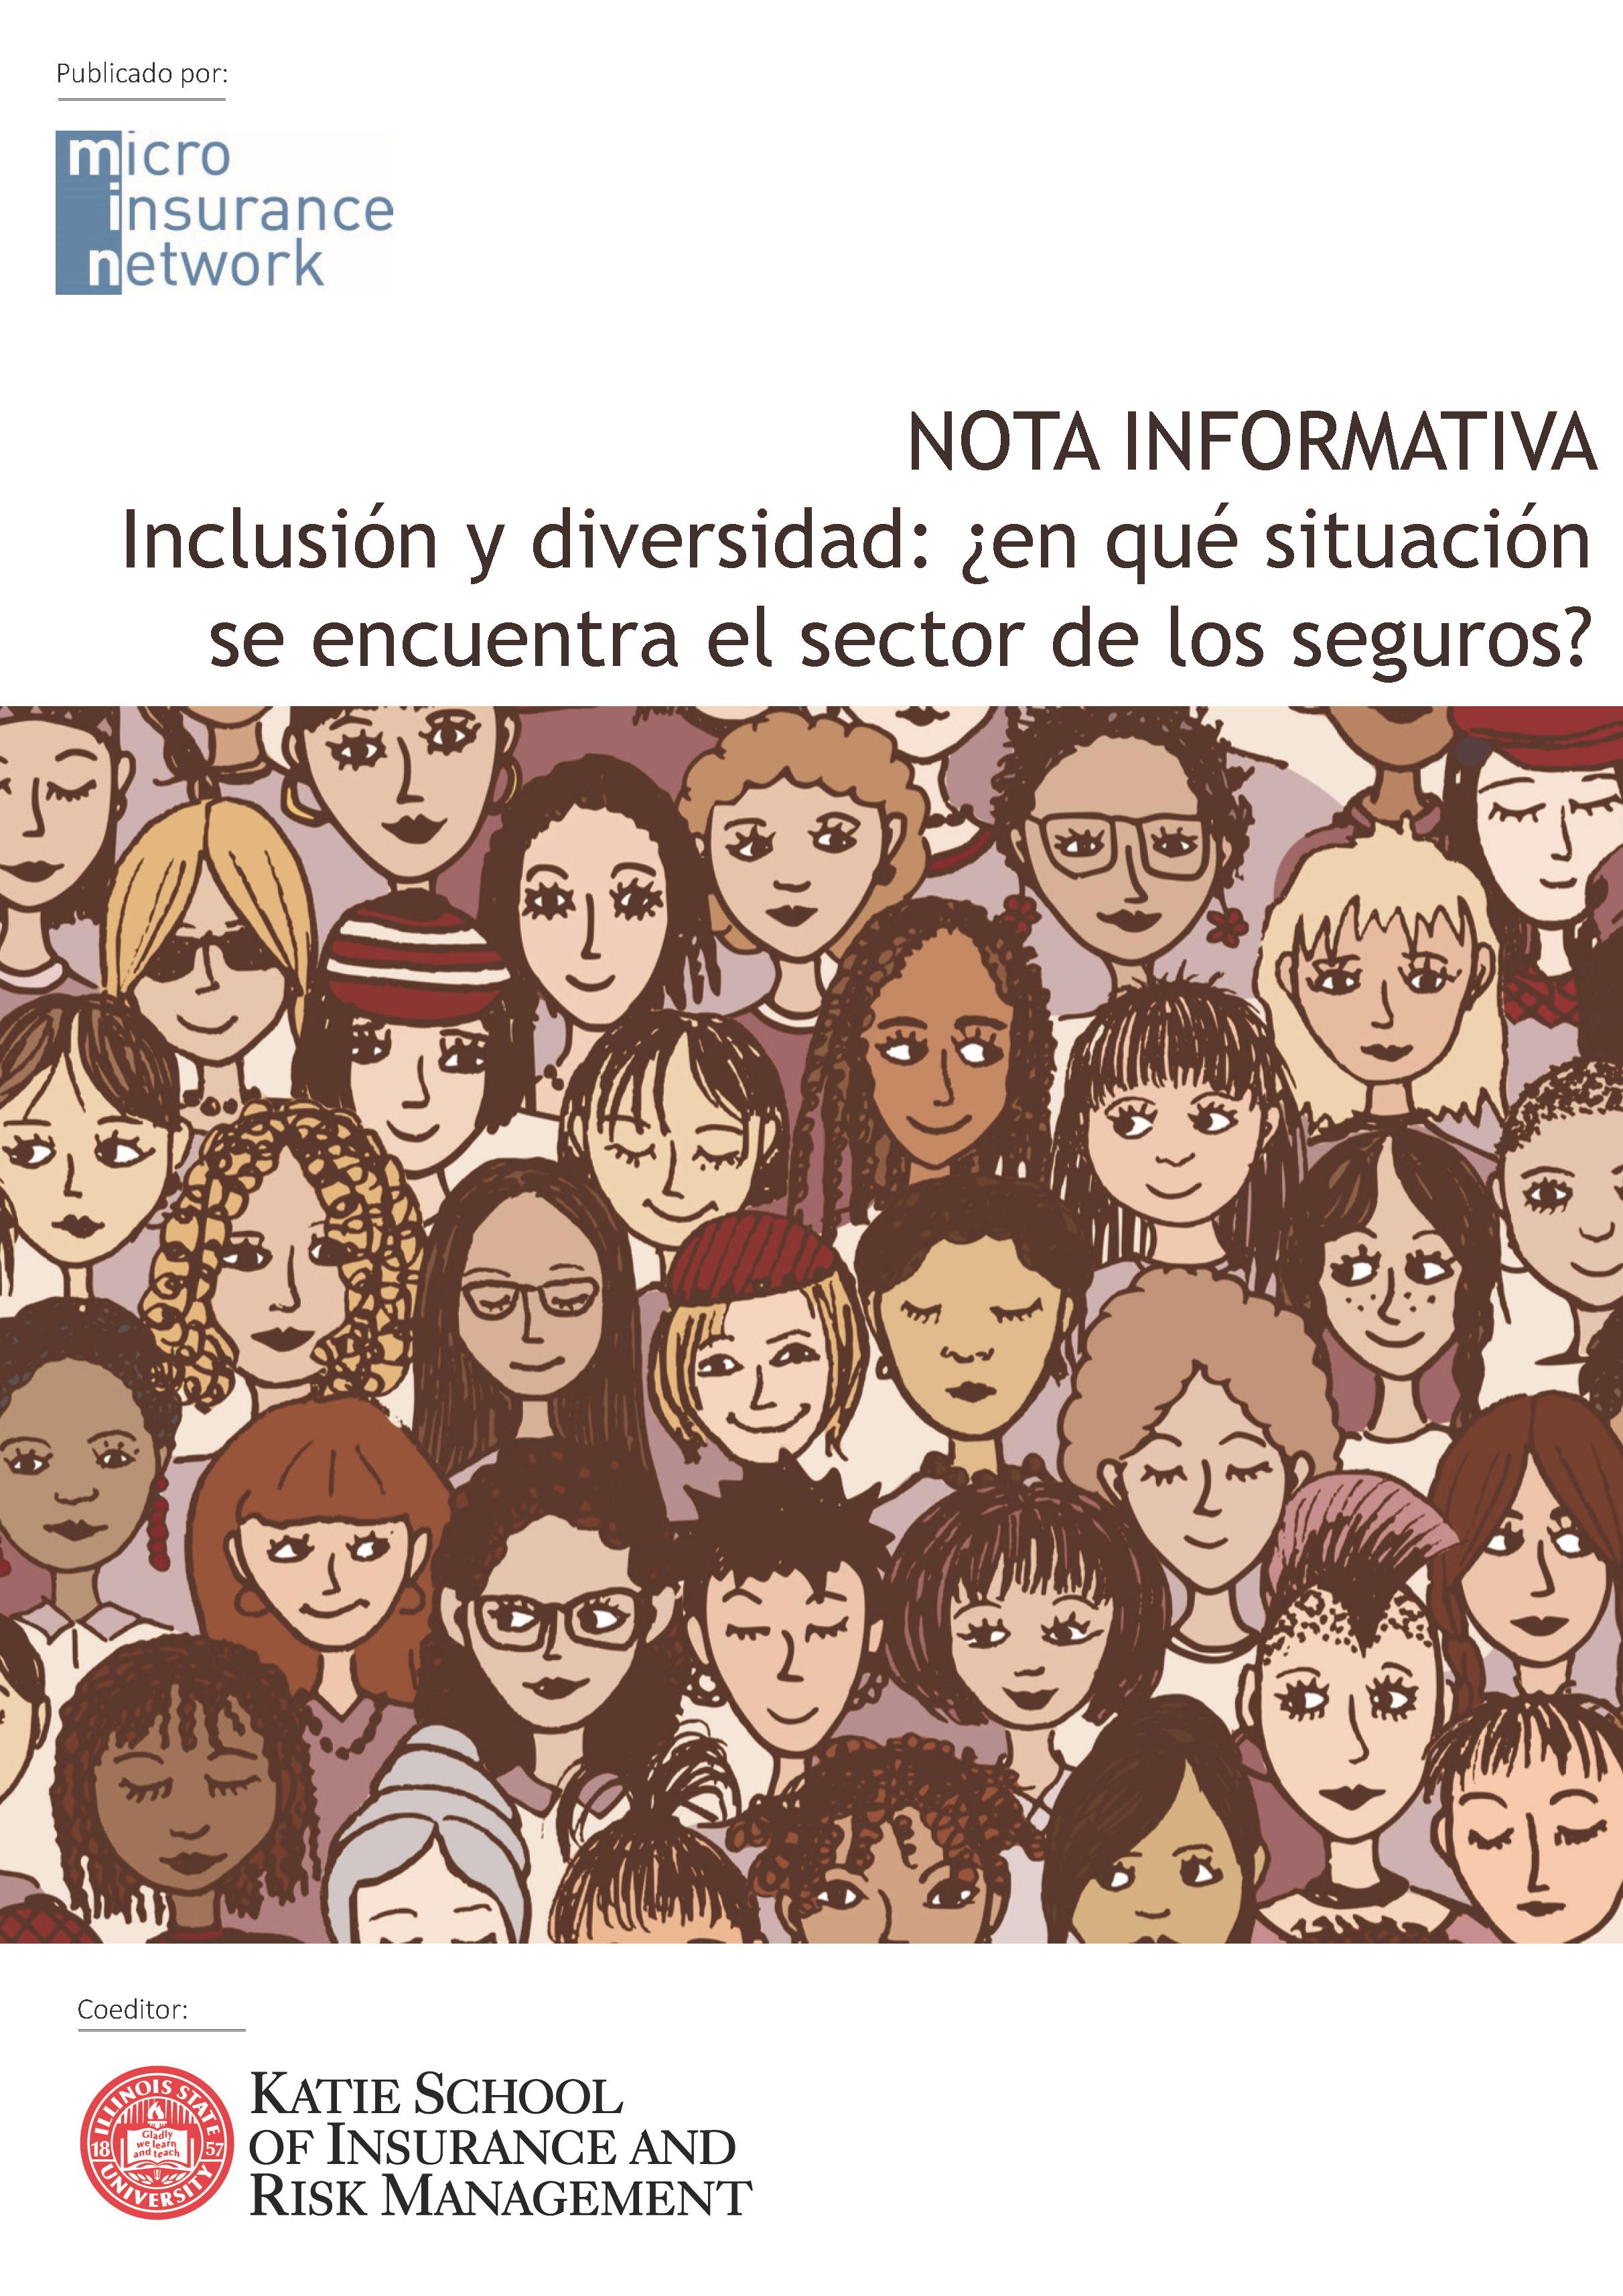 Briefing paper_Inclusion & Diversity_ES_0-1.png